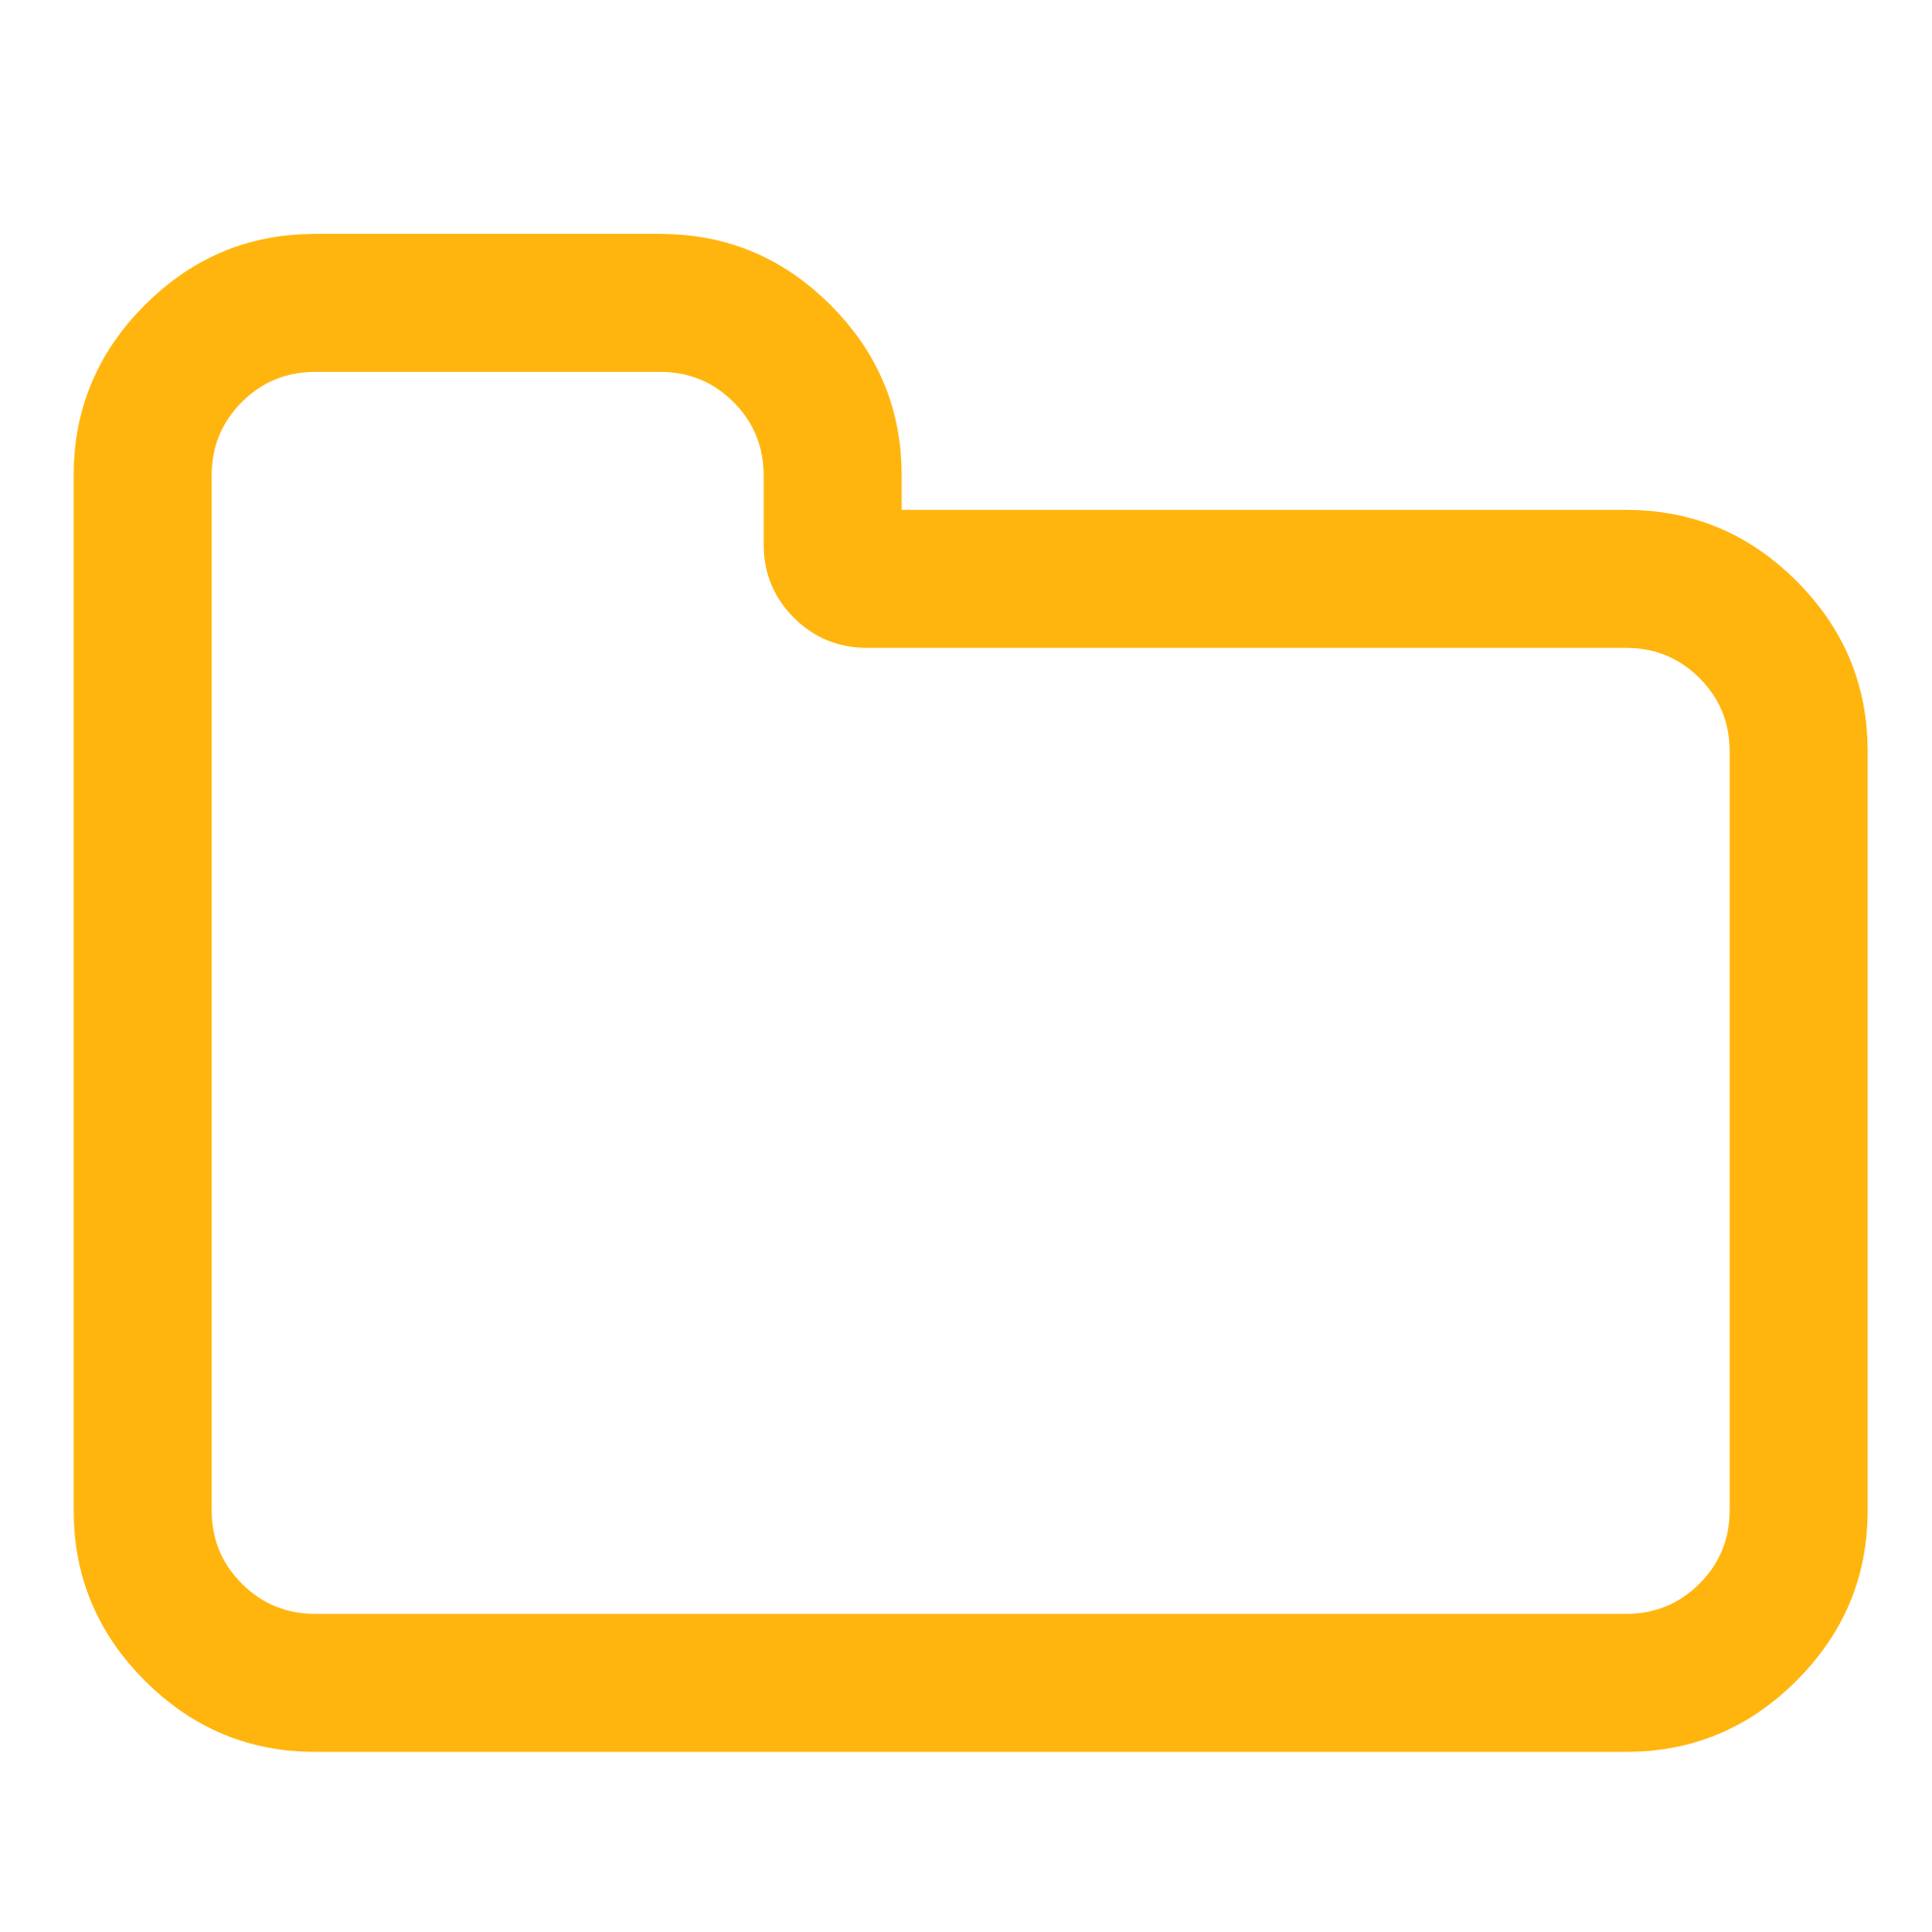 Folder clipart pocket folder. Yellow cliparts shop of